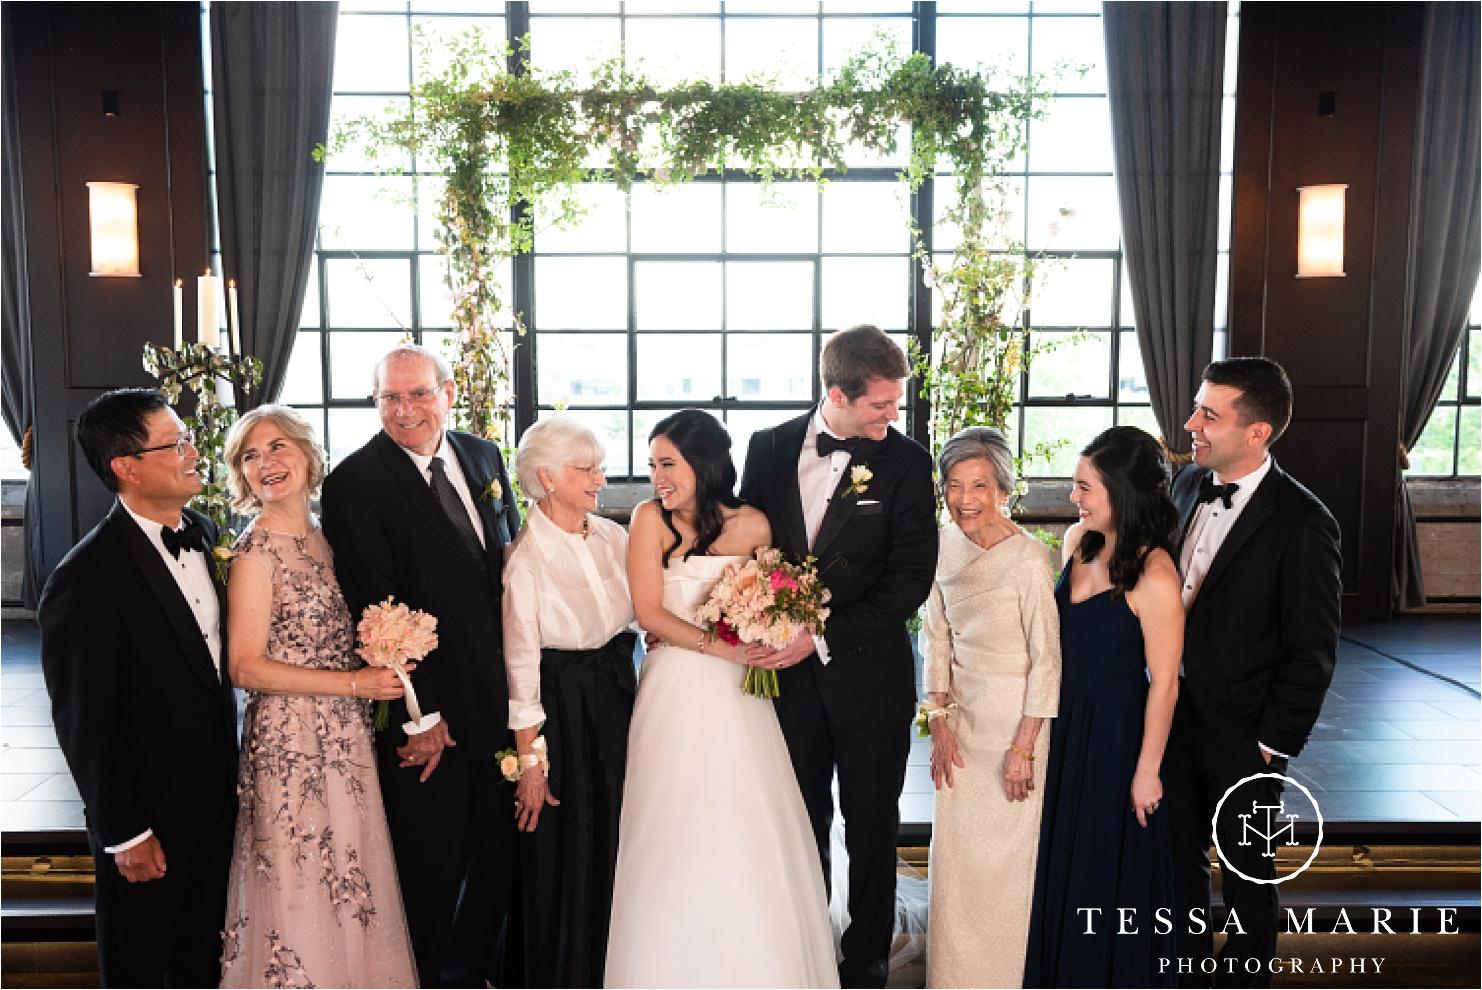 Tessa_marie_weddings_houston_wedding_photographer_The_astorian_0135.jpg